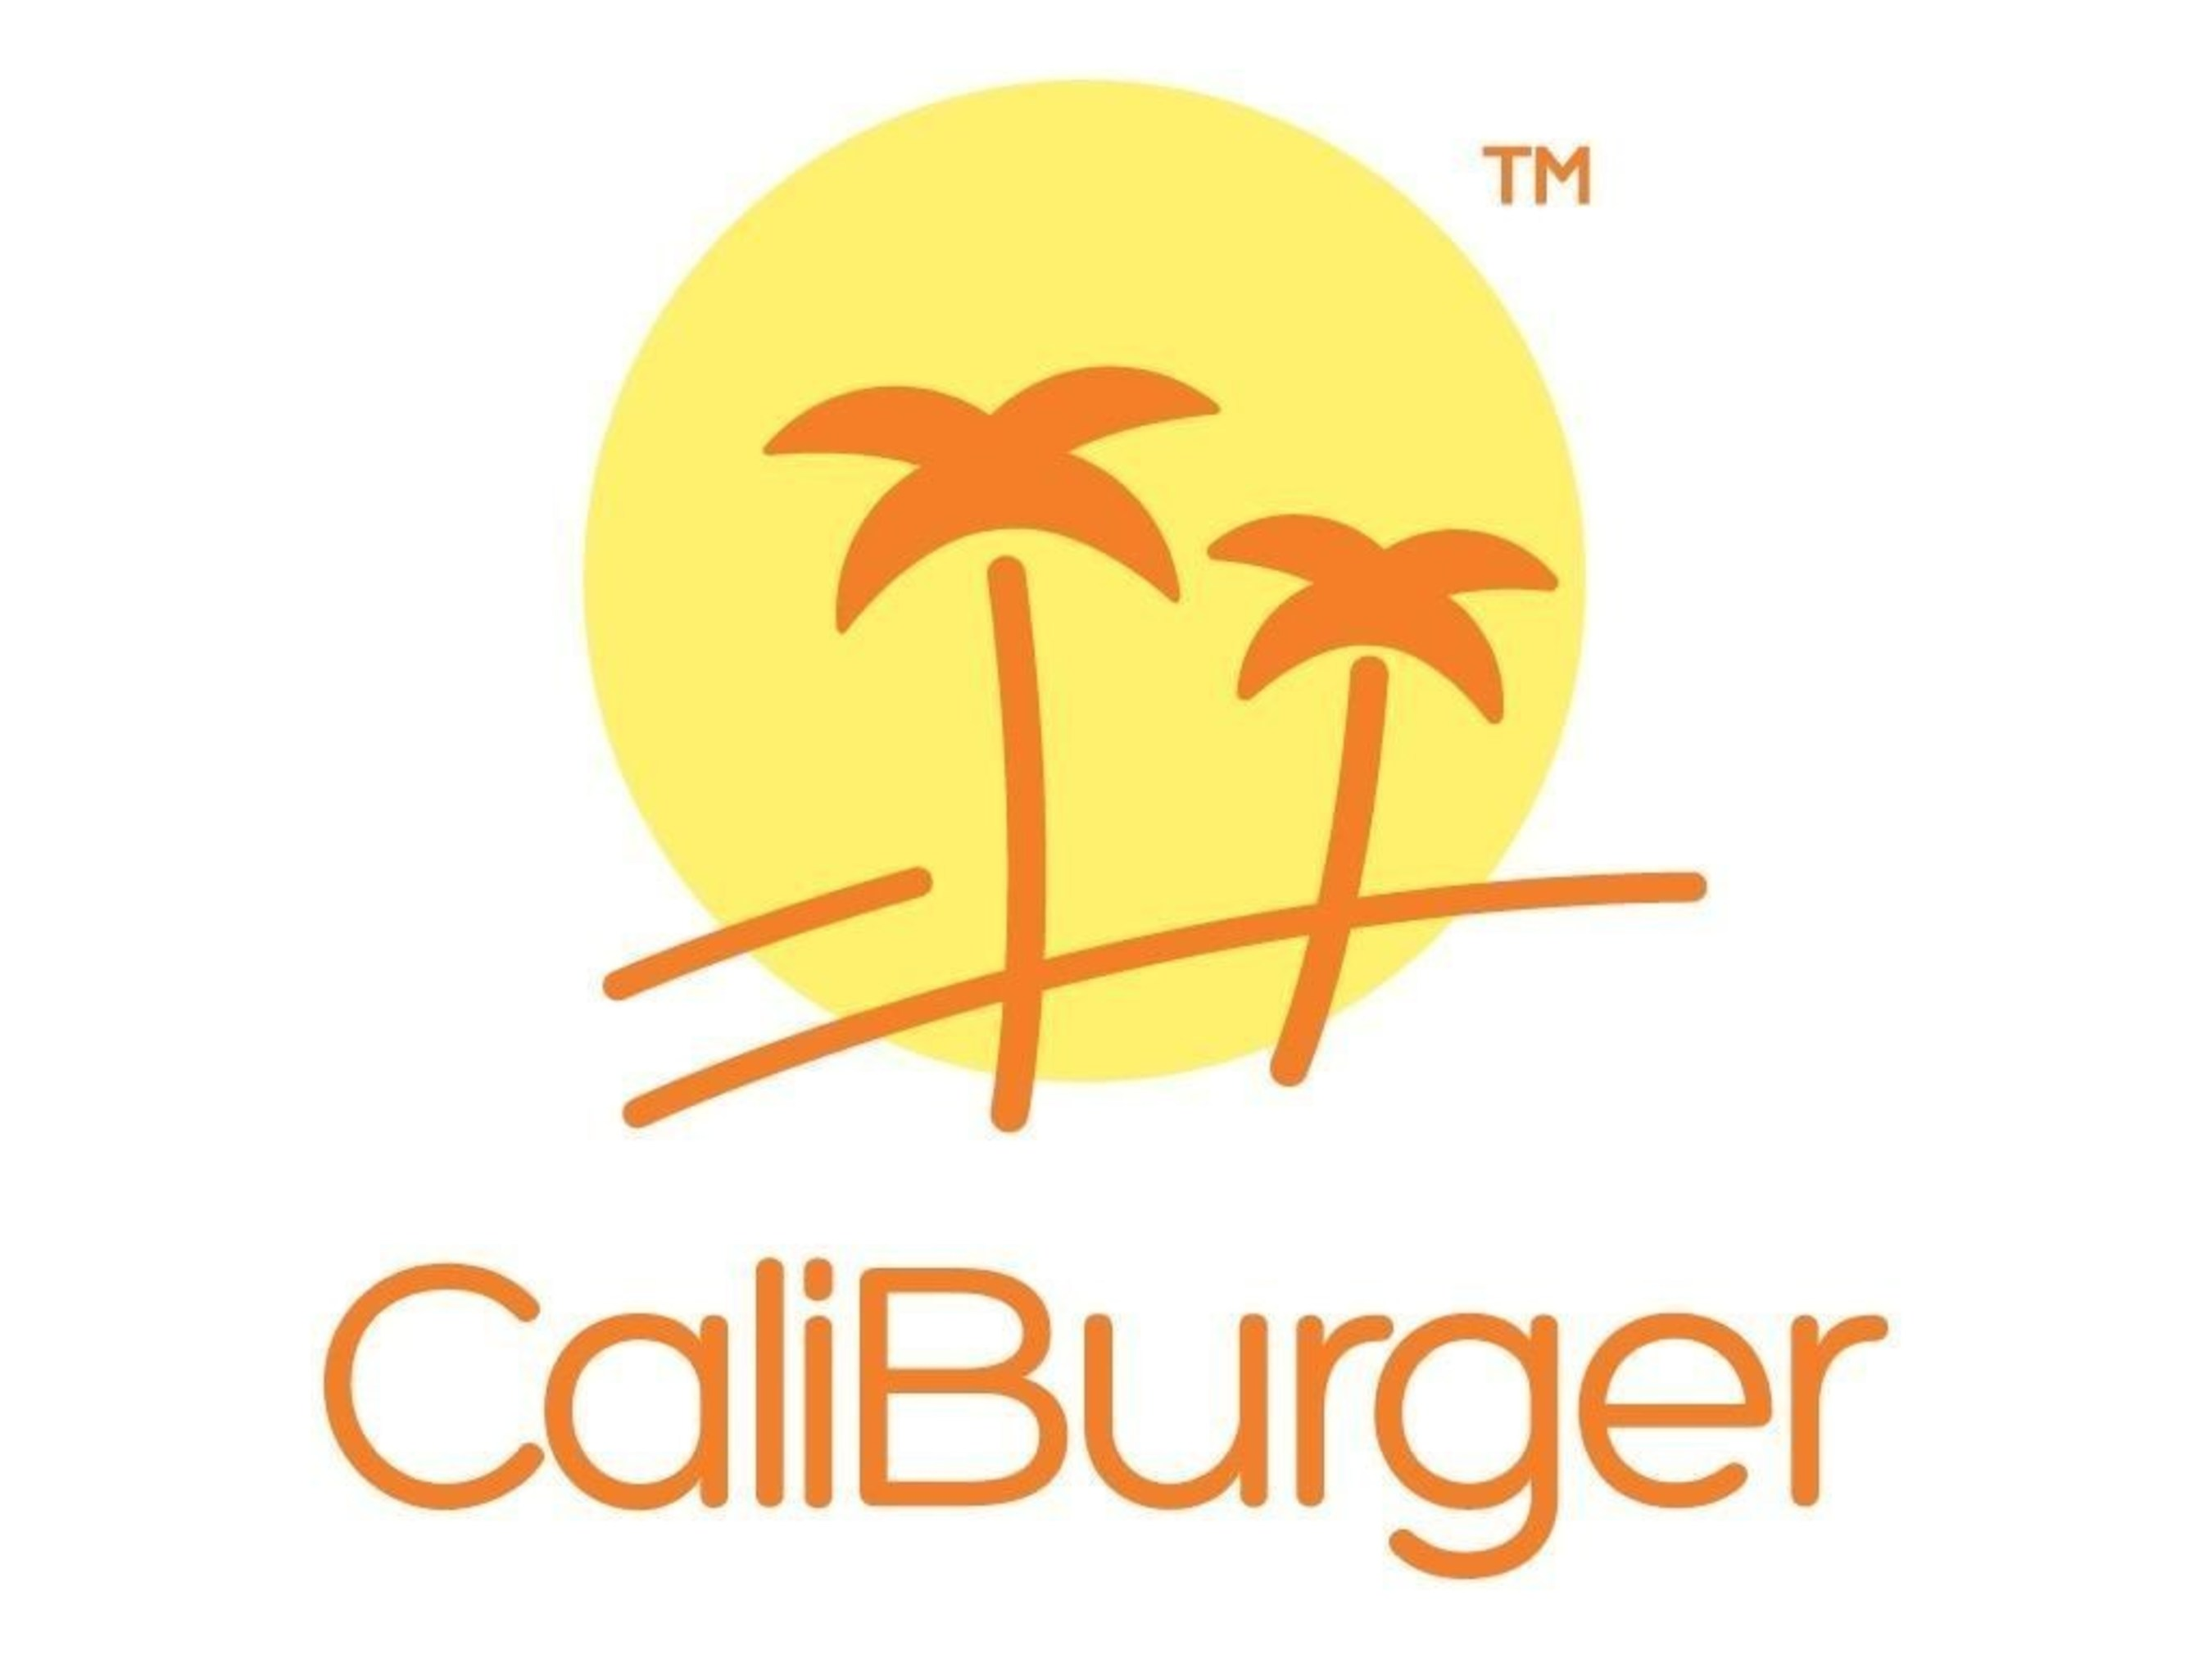 CaliBurger Announces Second FunWall Tournament: Ice Spire - Cash Climb